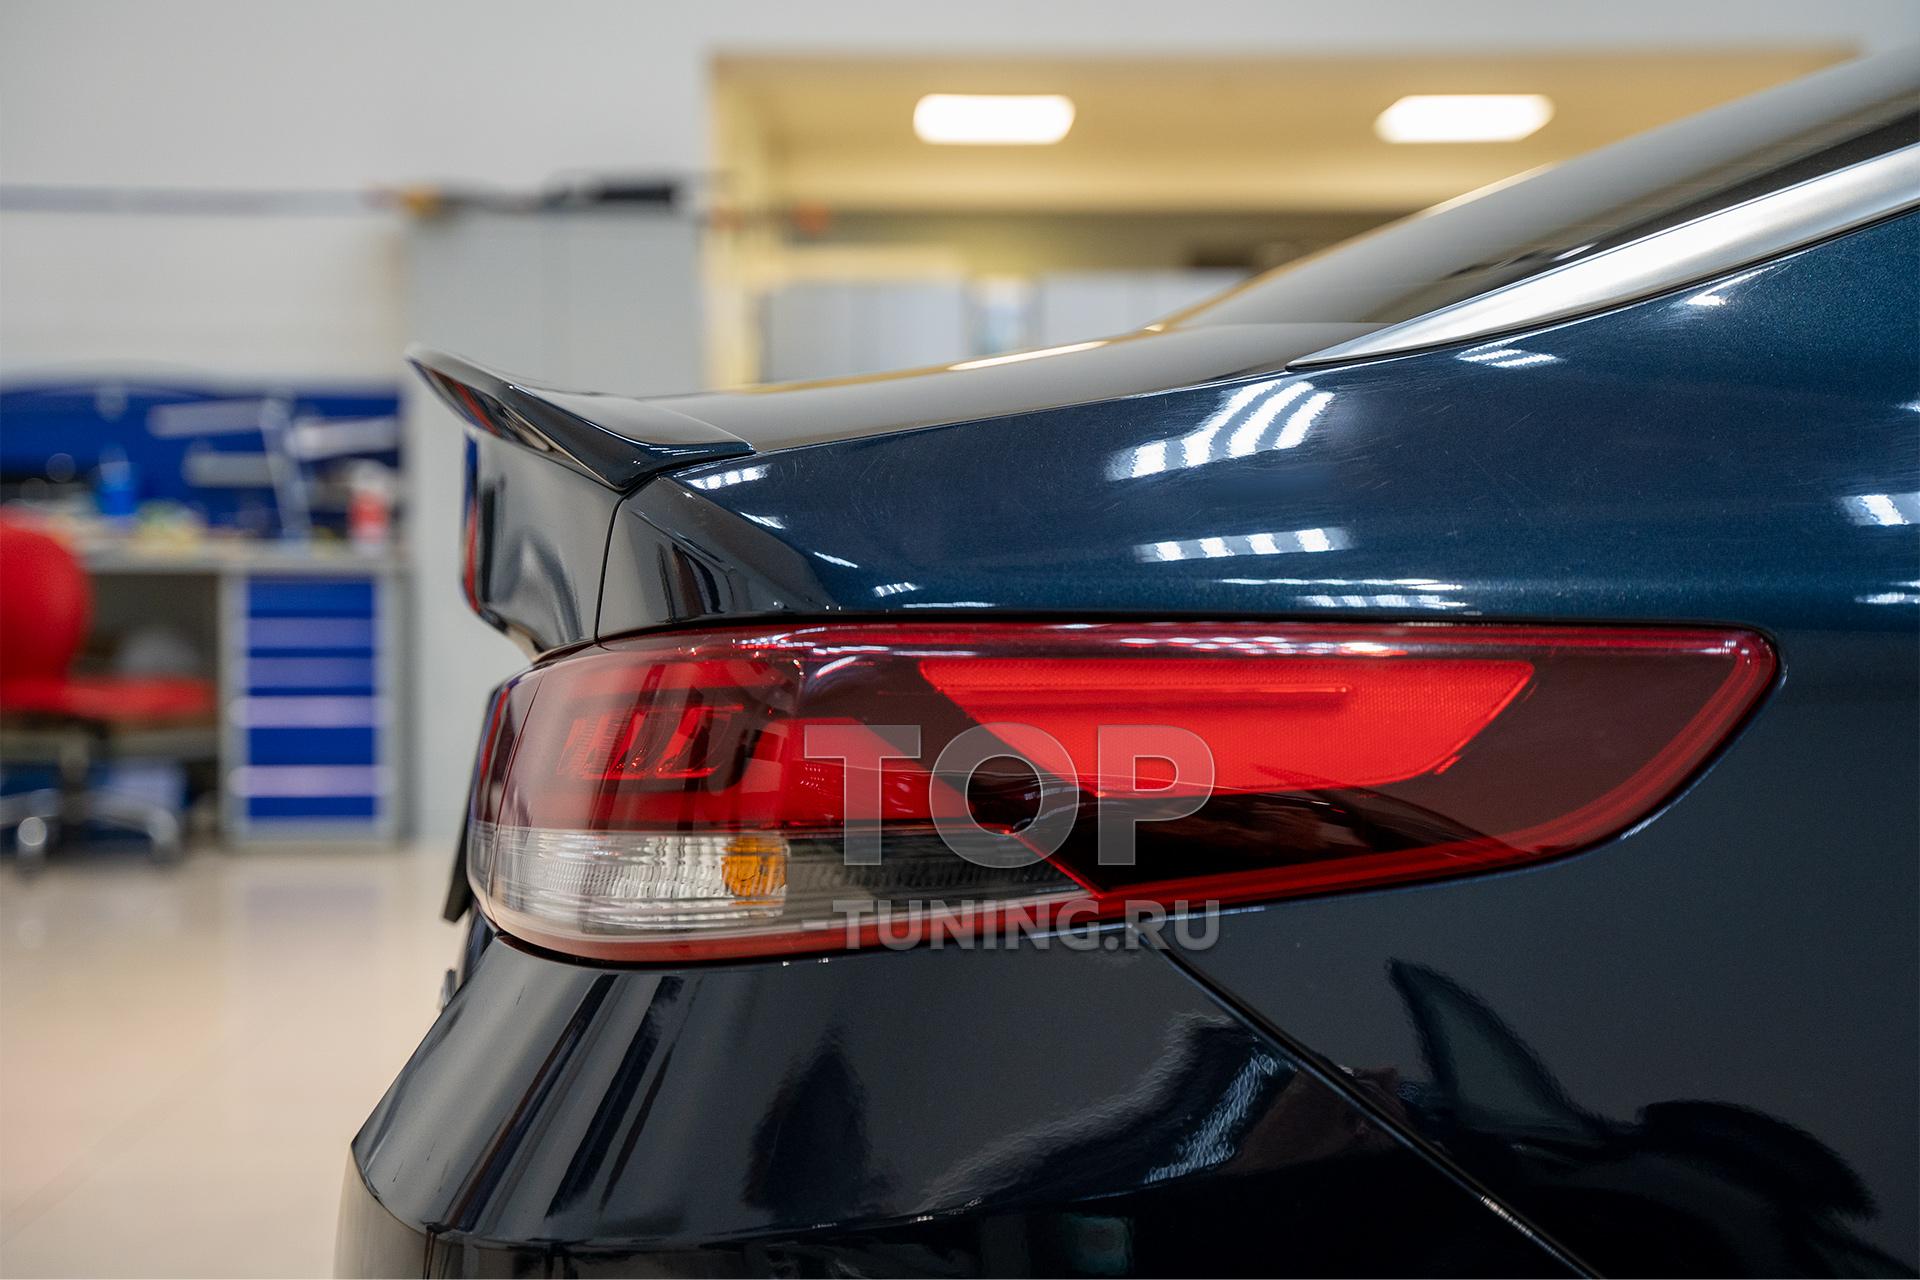 Тюнинг Киа Оптима 4 - Спойлер Advance на крышку багажника